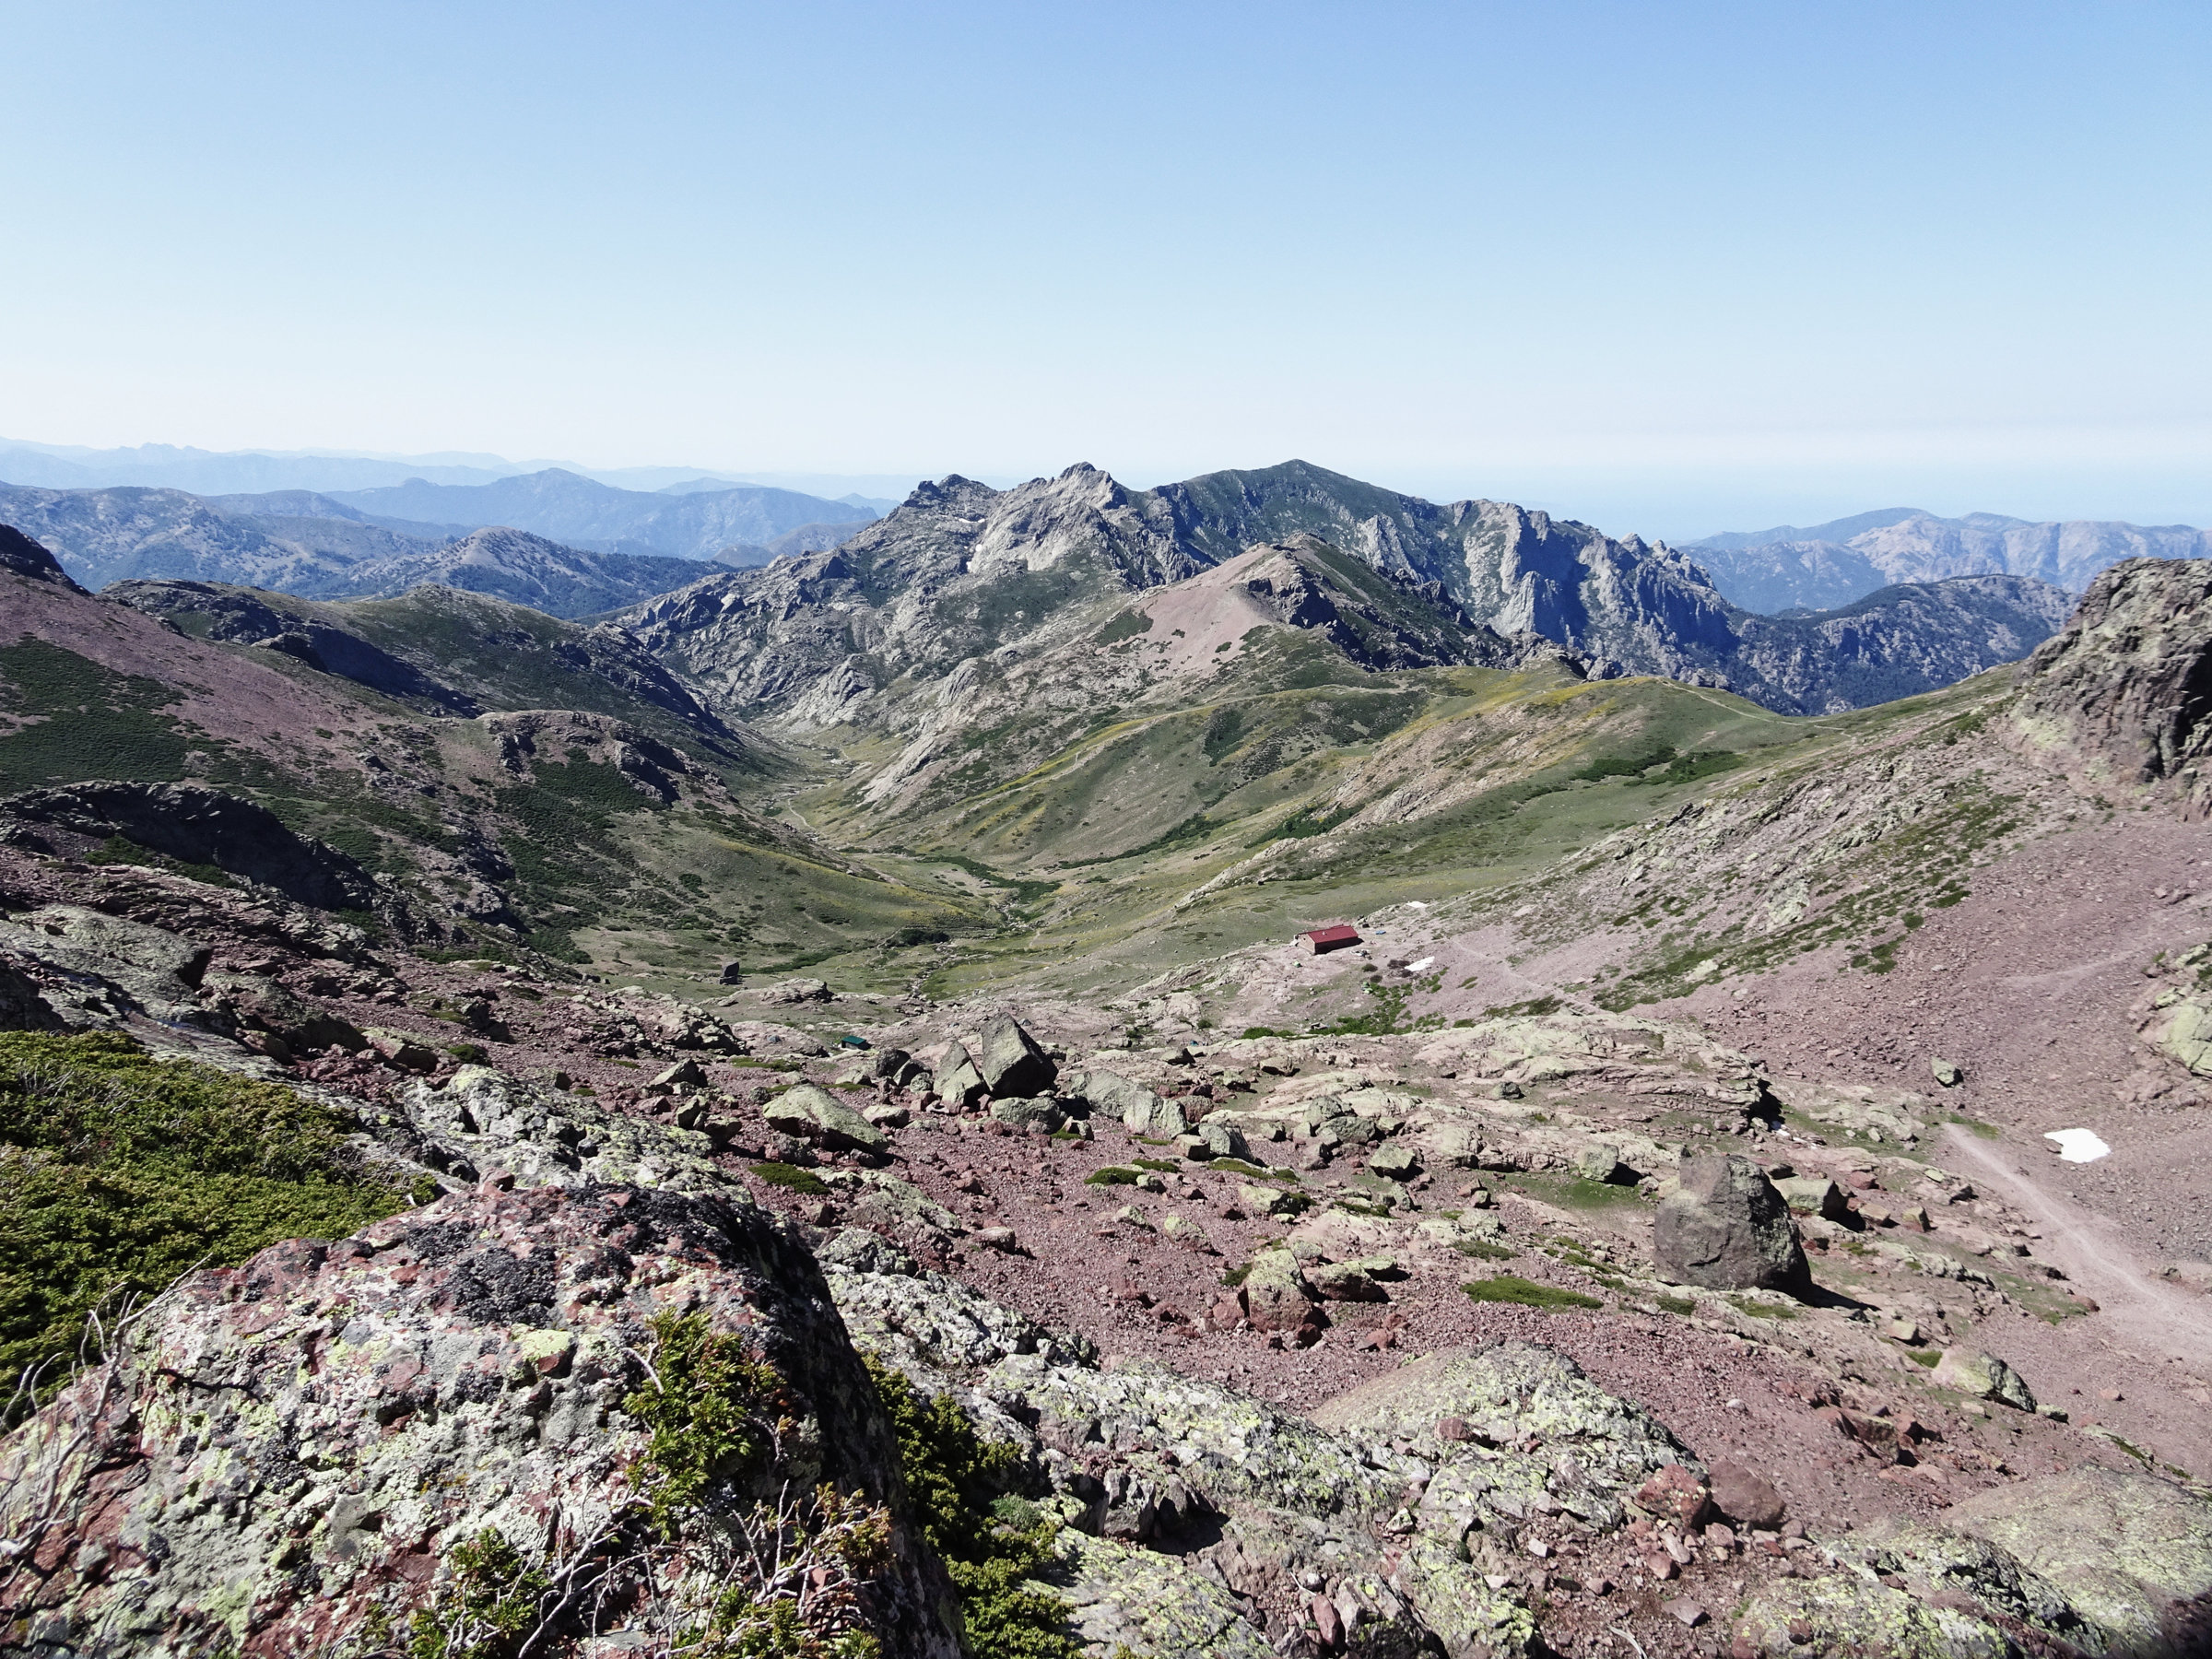 Ciuttulu di i Mori, Korsika, GR20 Weitwanderweg, Wandern, Berge, Frankreich